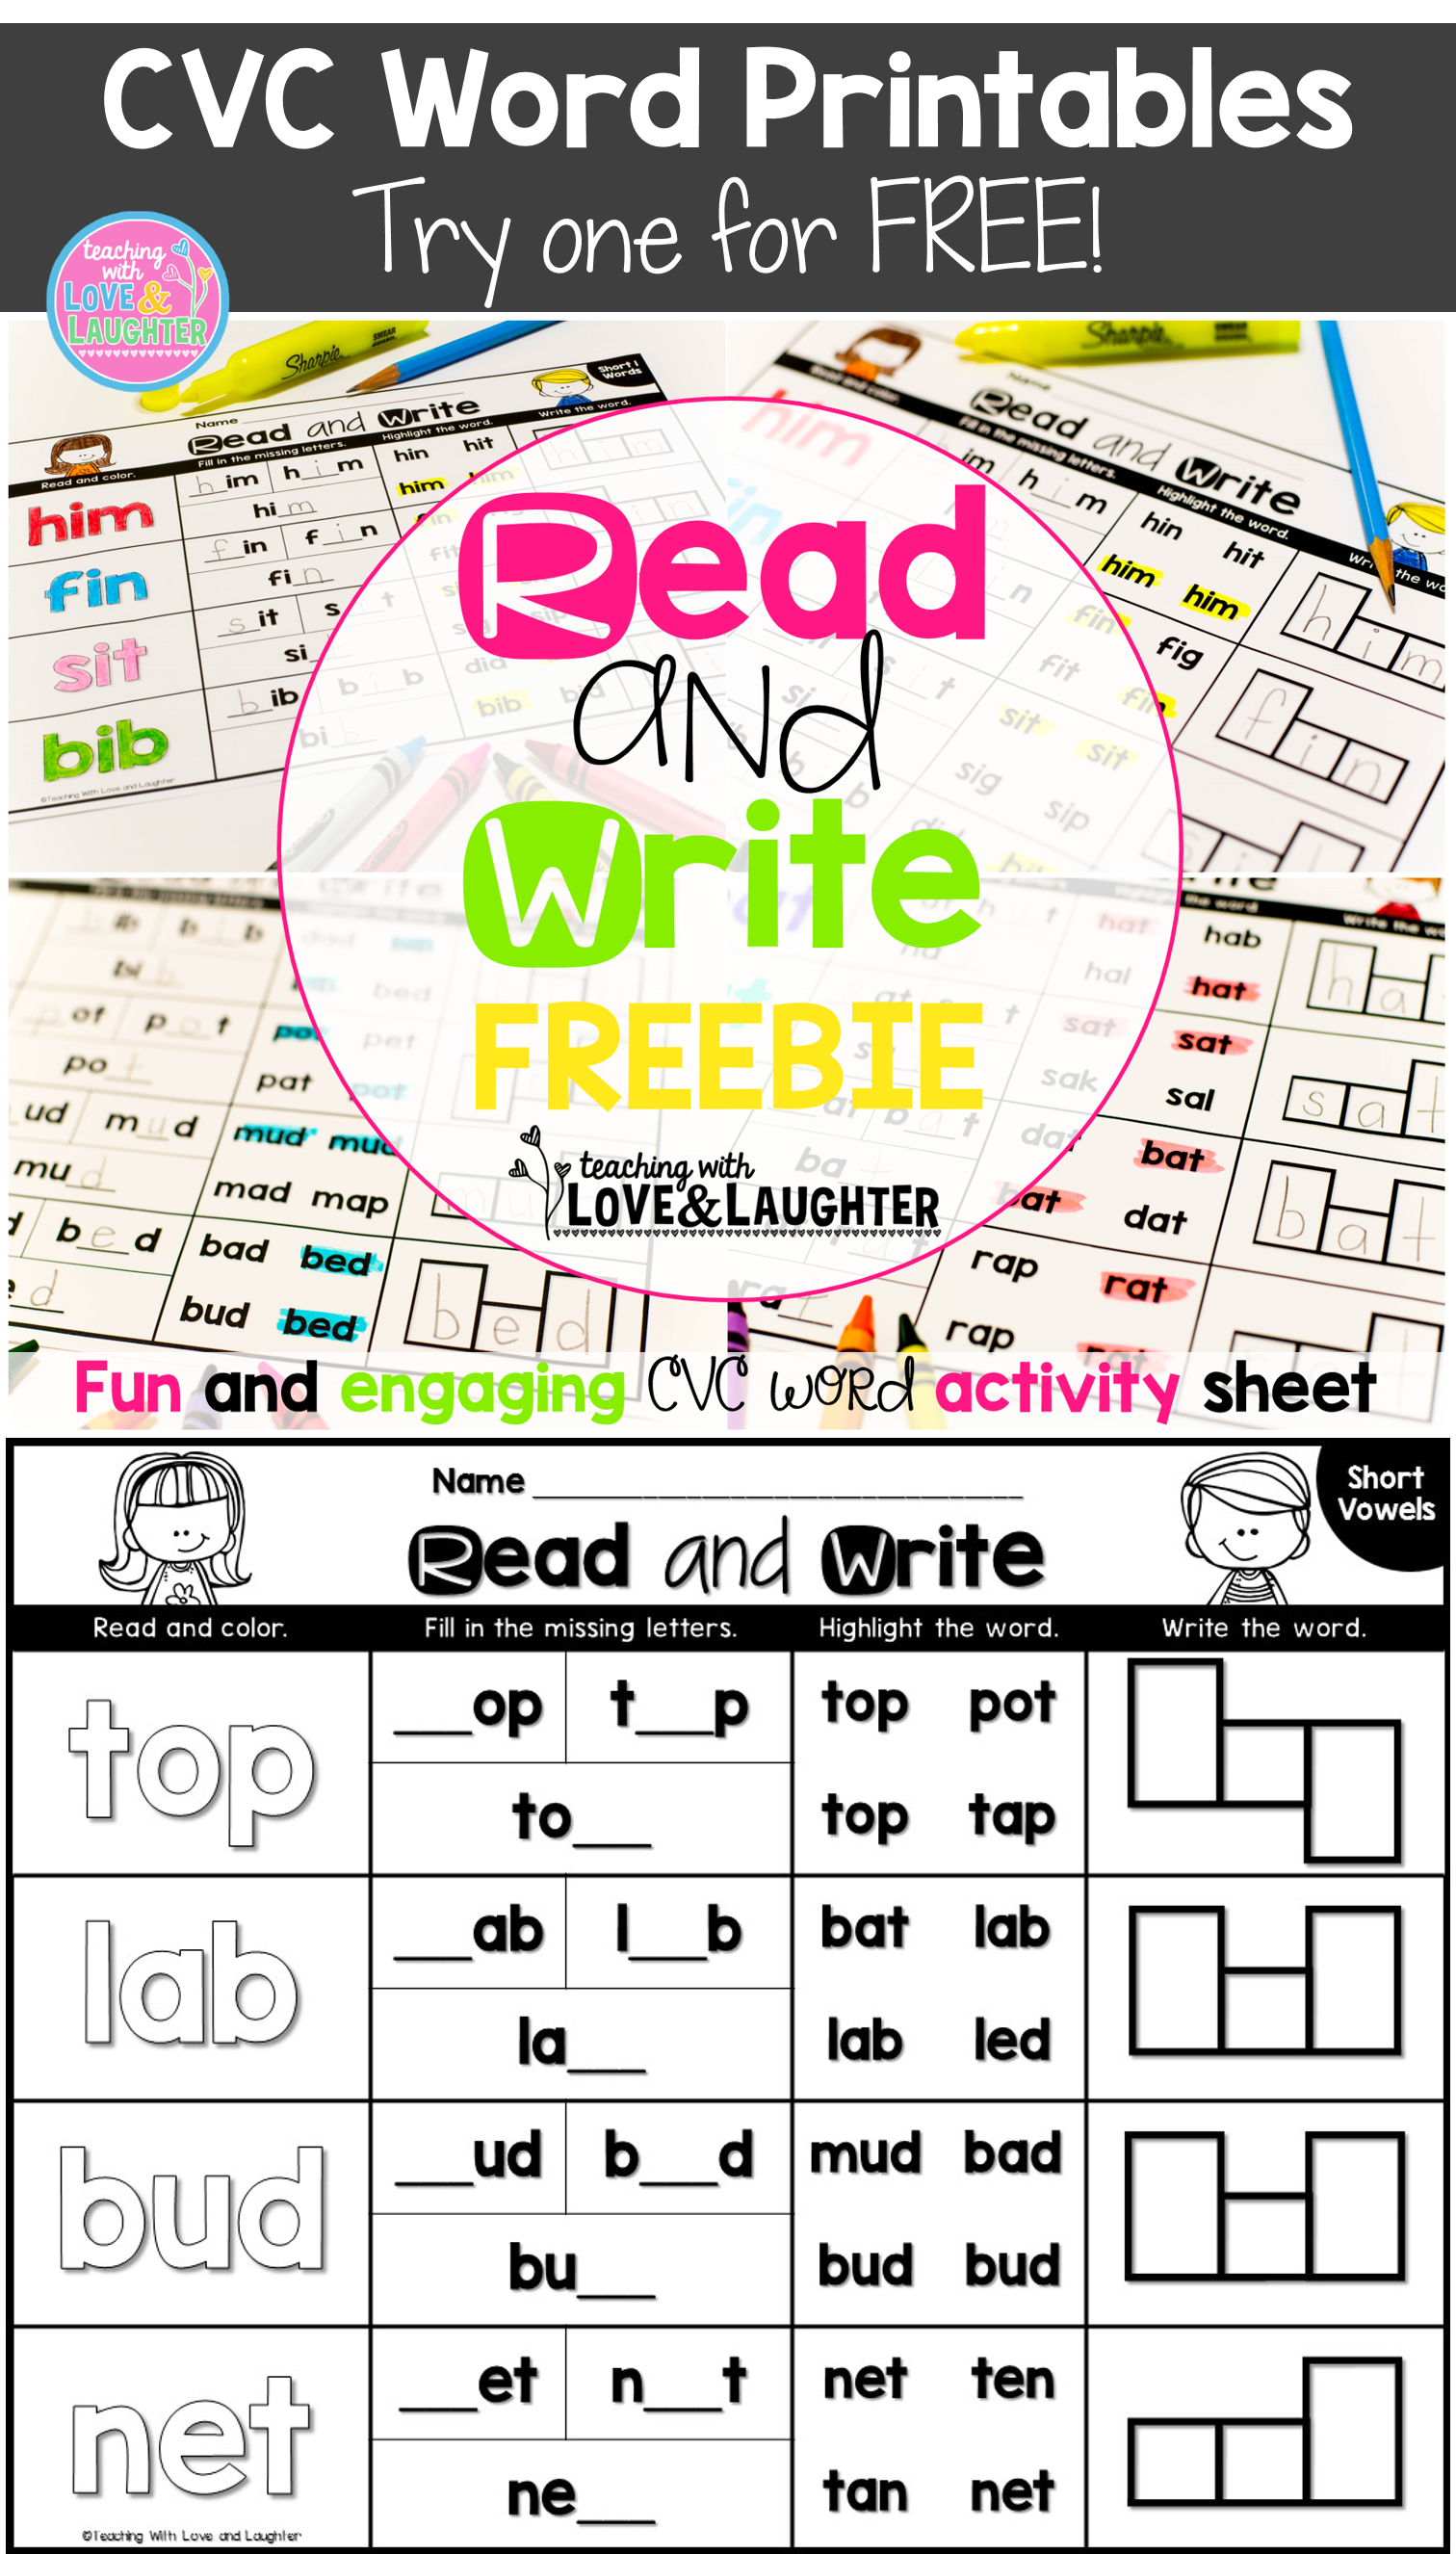 Try A Free Cvc Word Activity Sheet